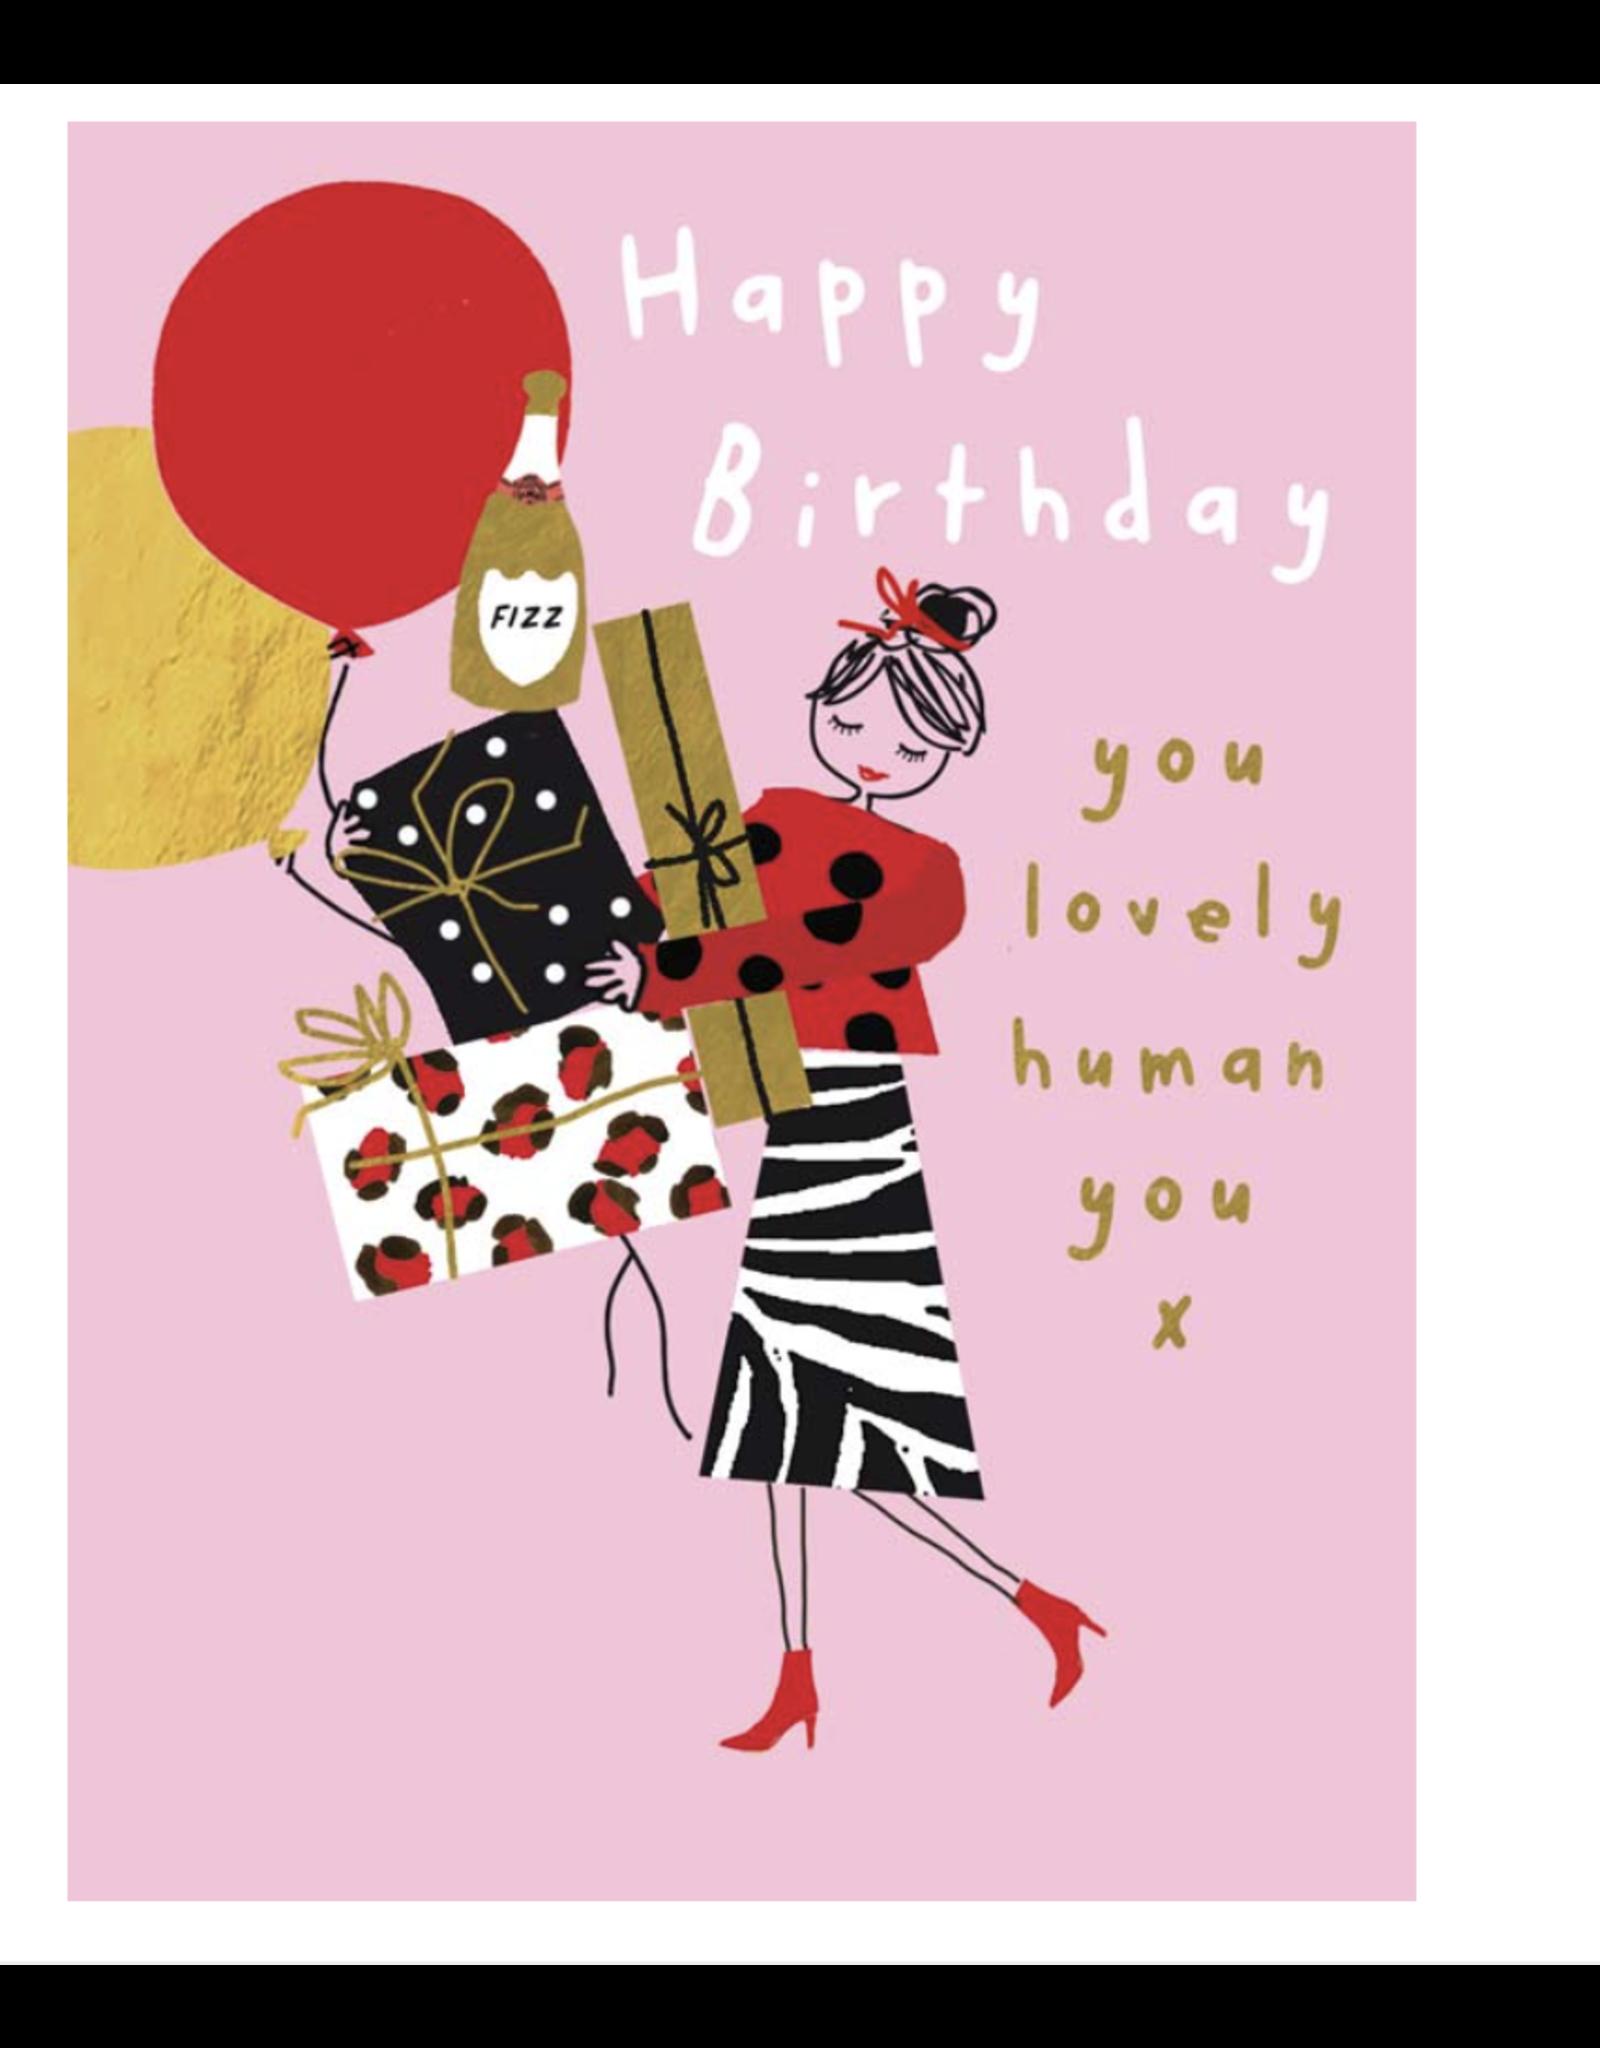 Birthday - You Lovely Human